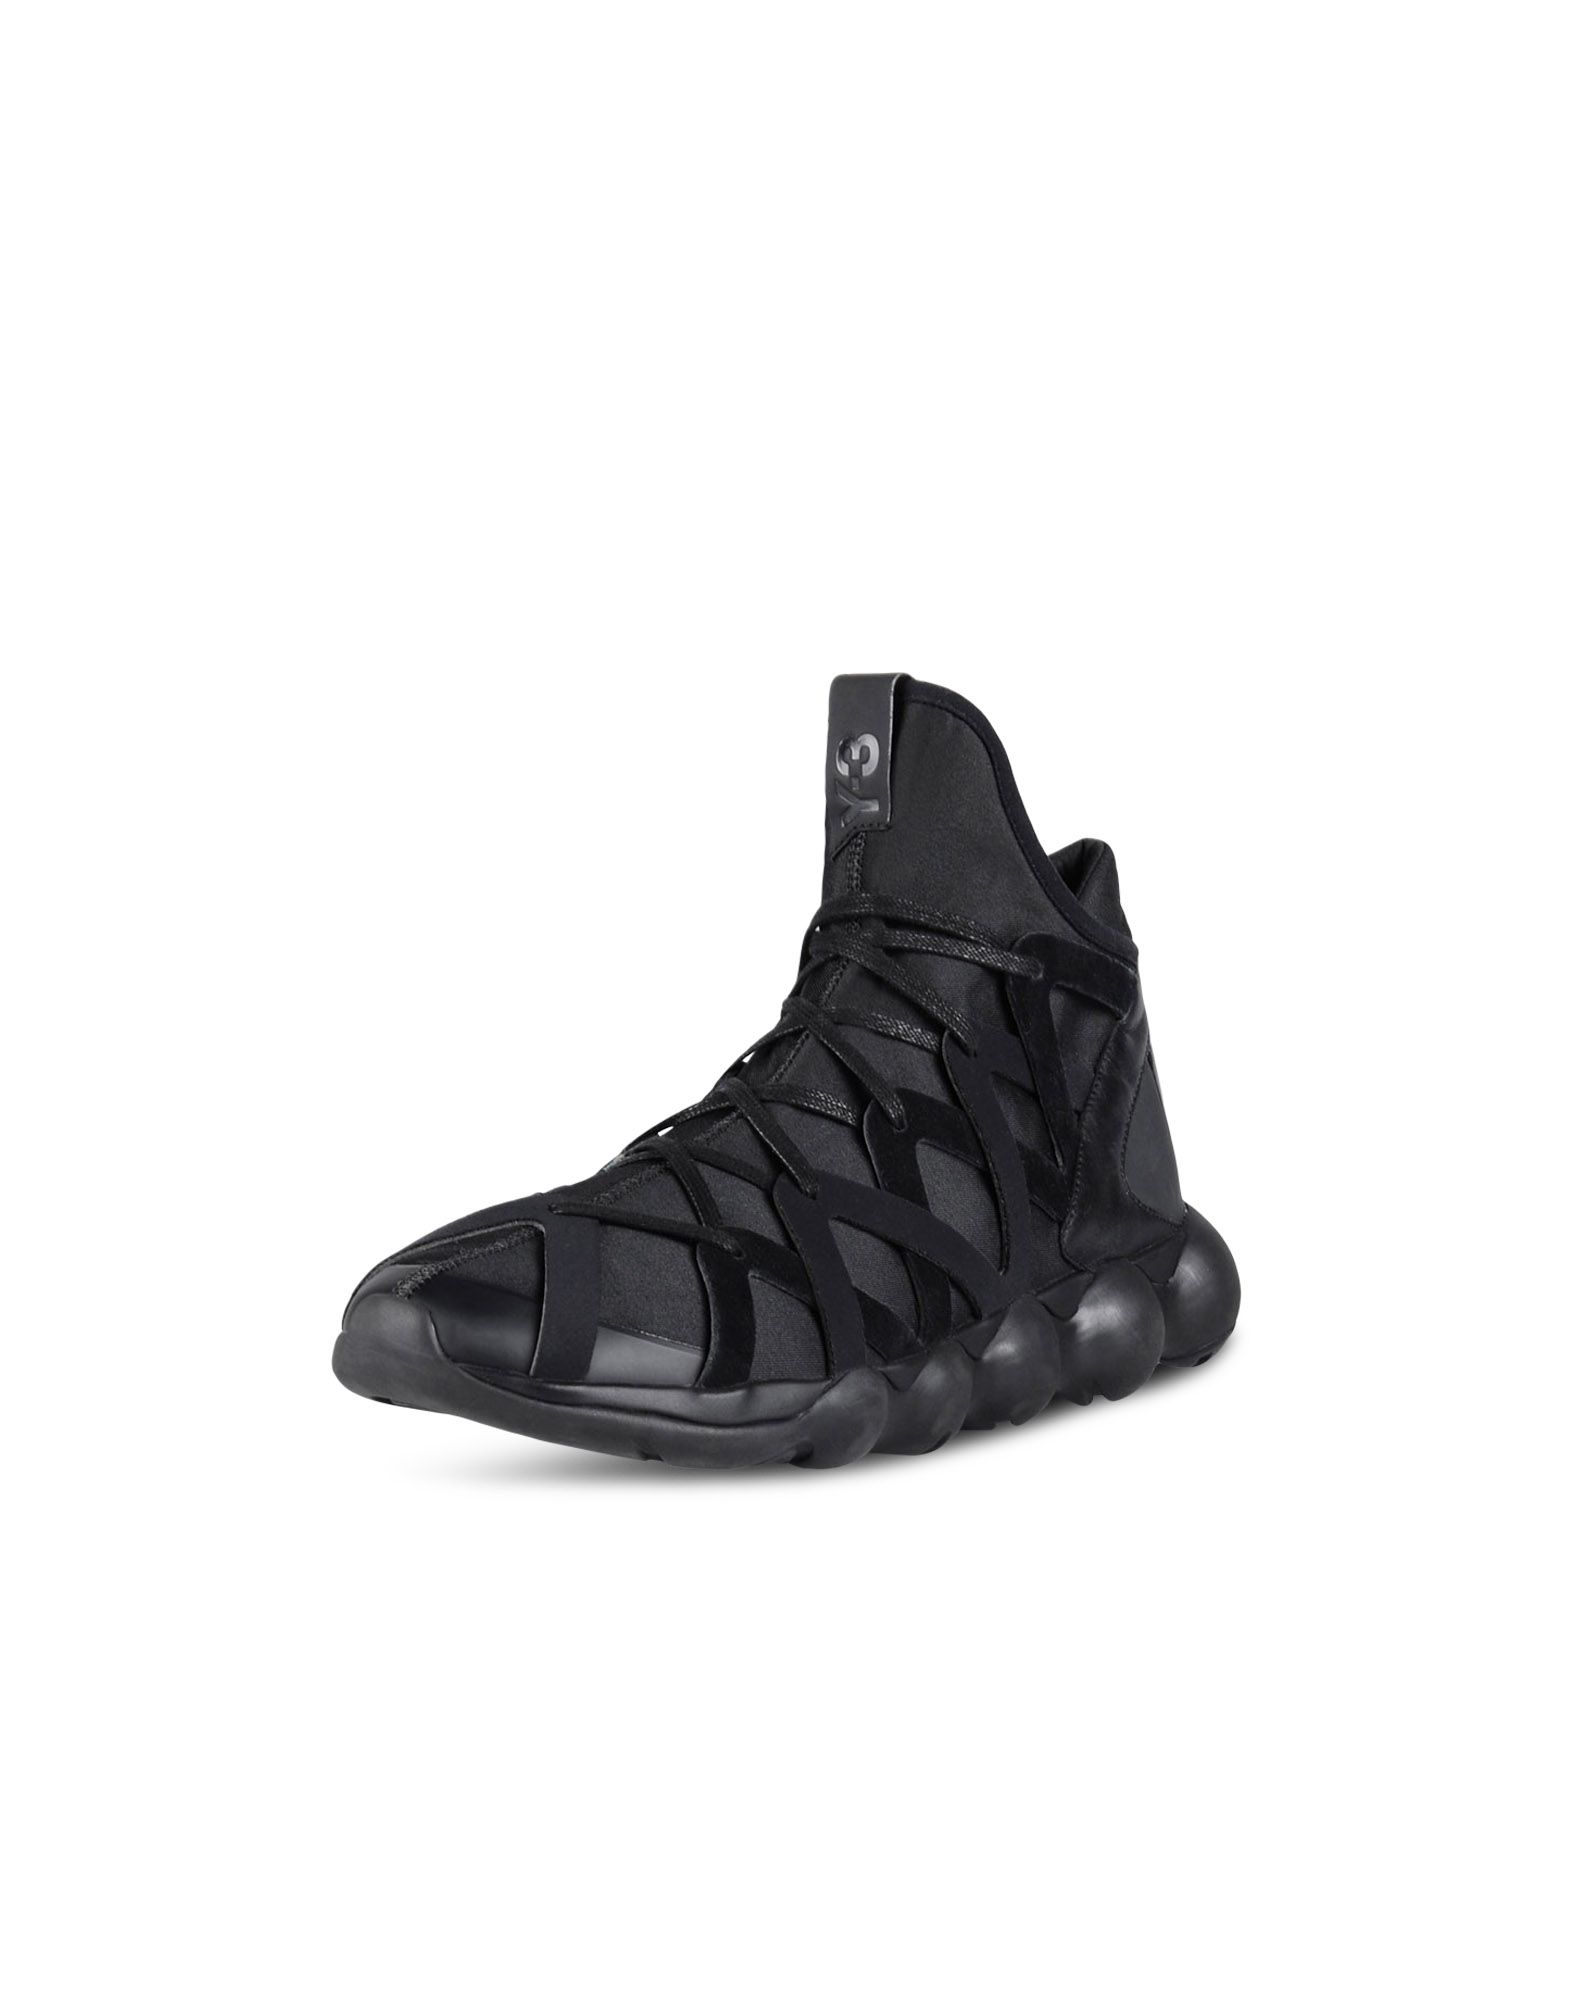 3437c69e7b046 ... Y-3 Y-3 KYUJO HIGH High-top sneakers Man ...